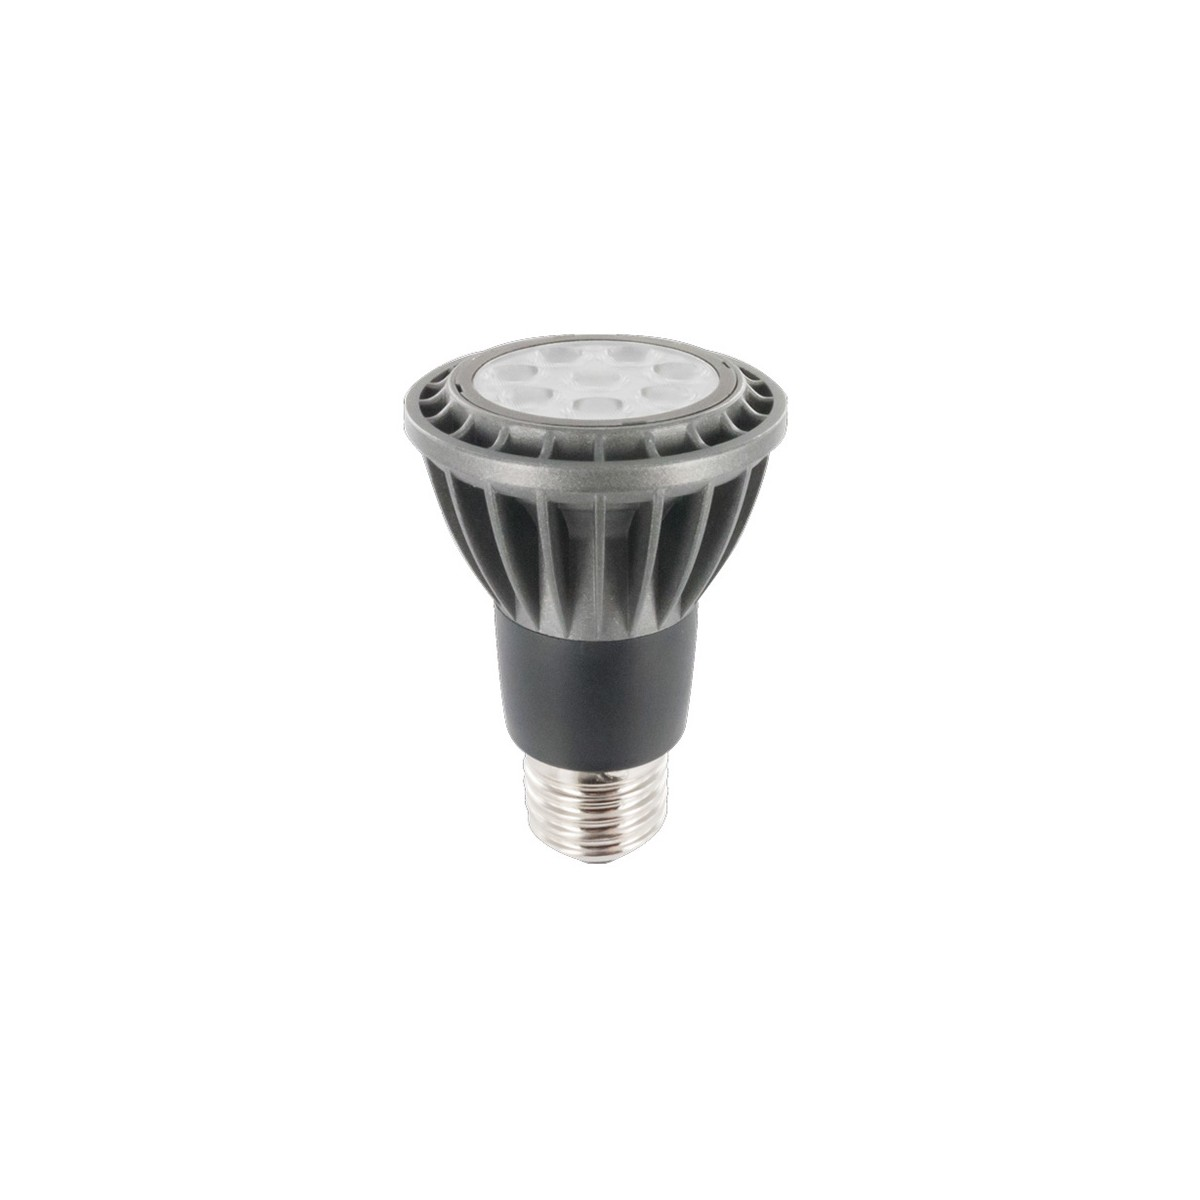 Integral LED PAR20 E27 7.5W 3000K 560lm Ściemnialny 57-53-74